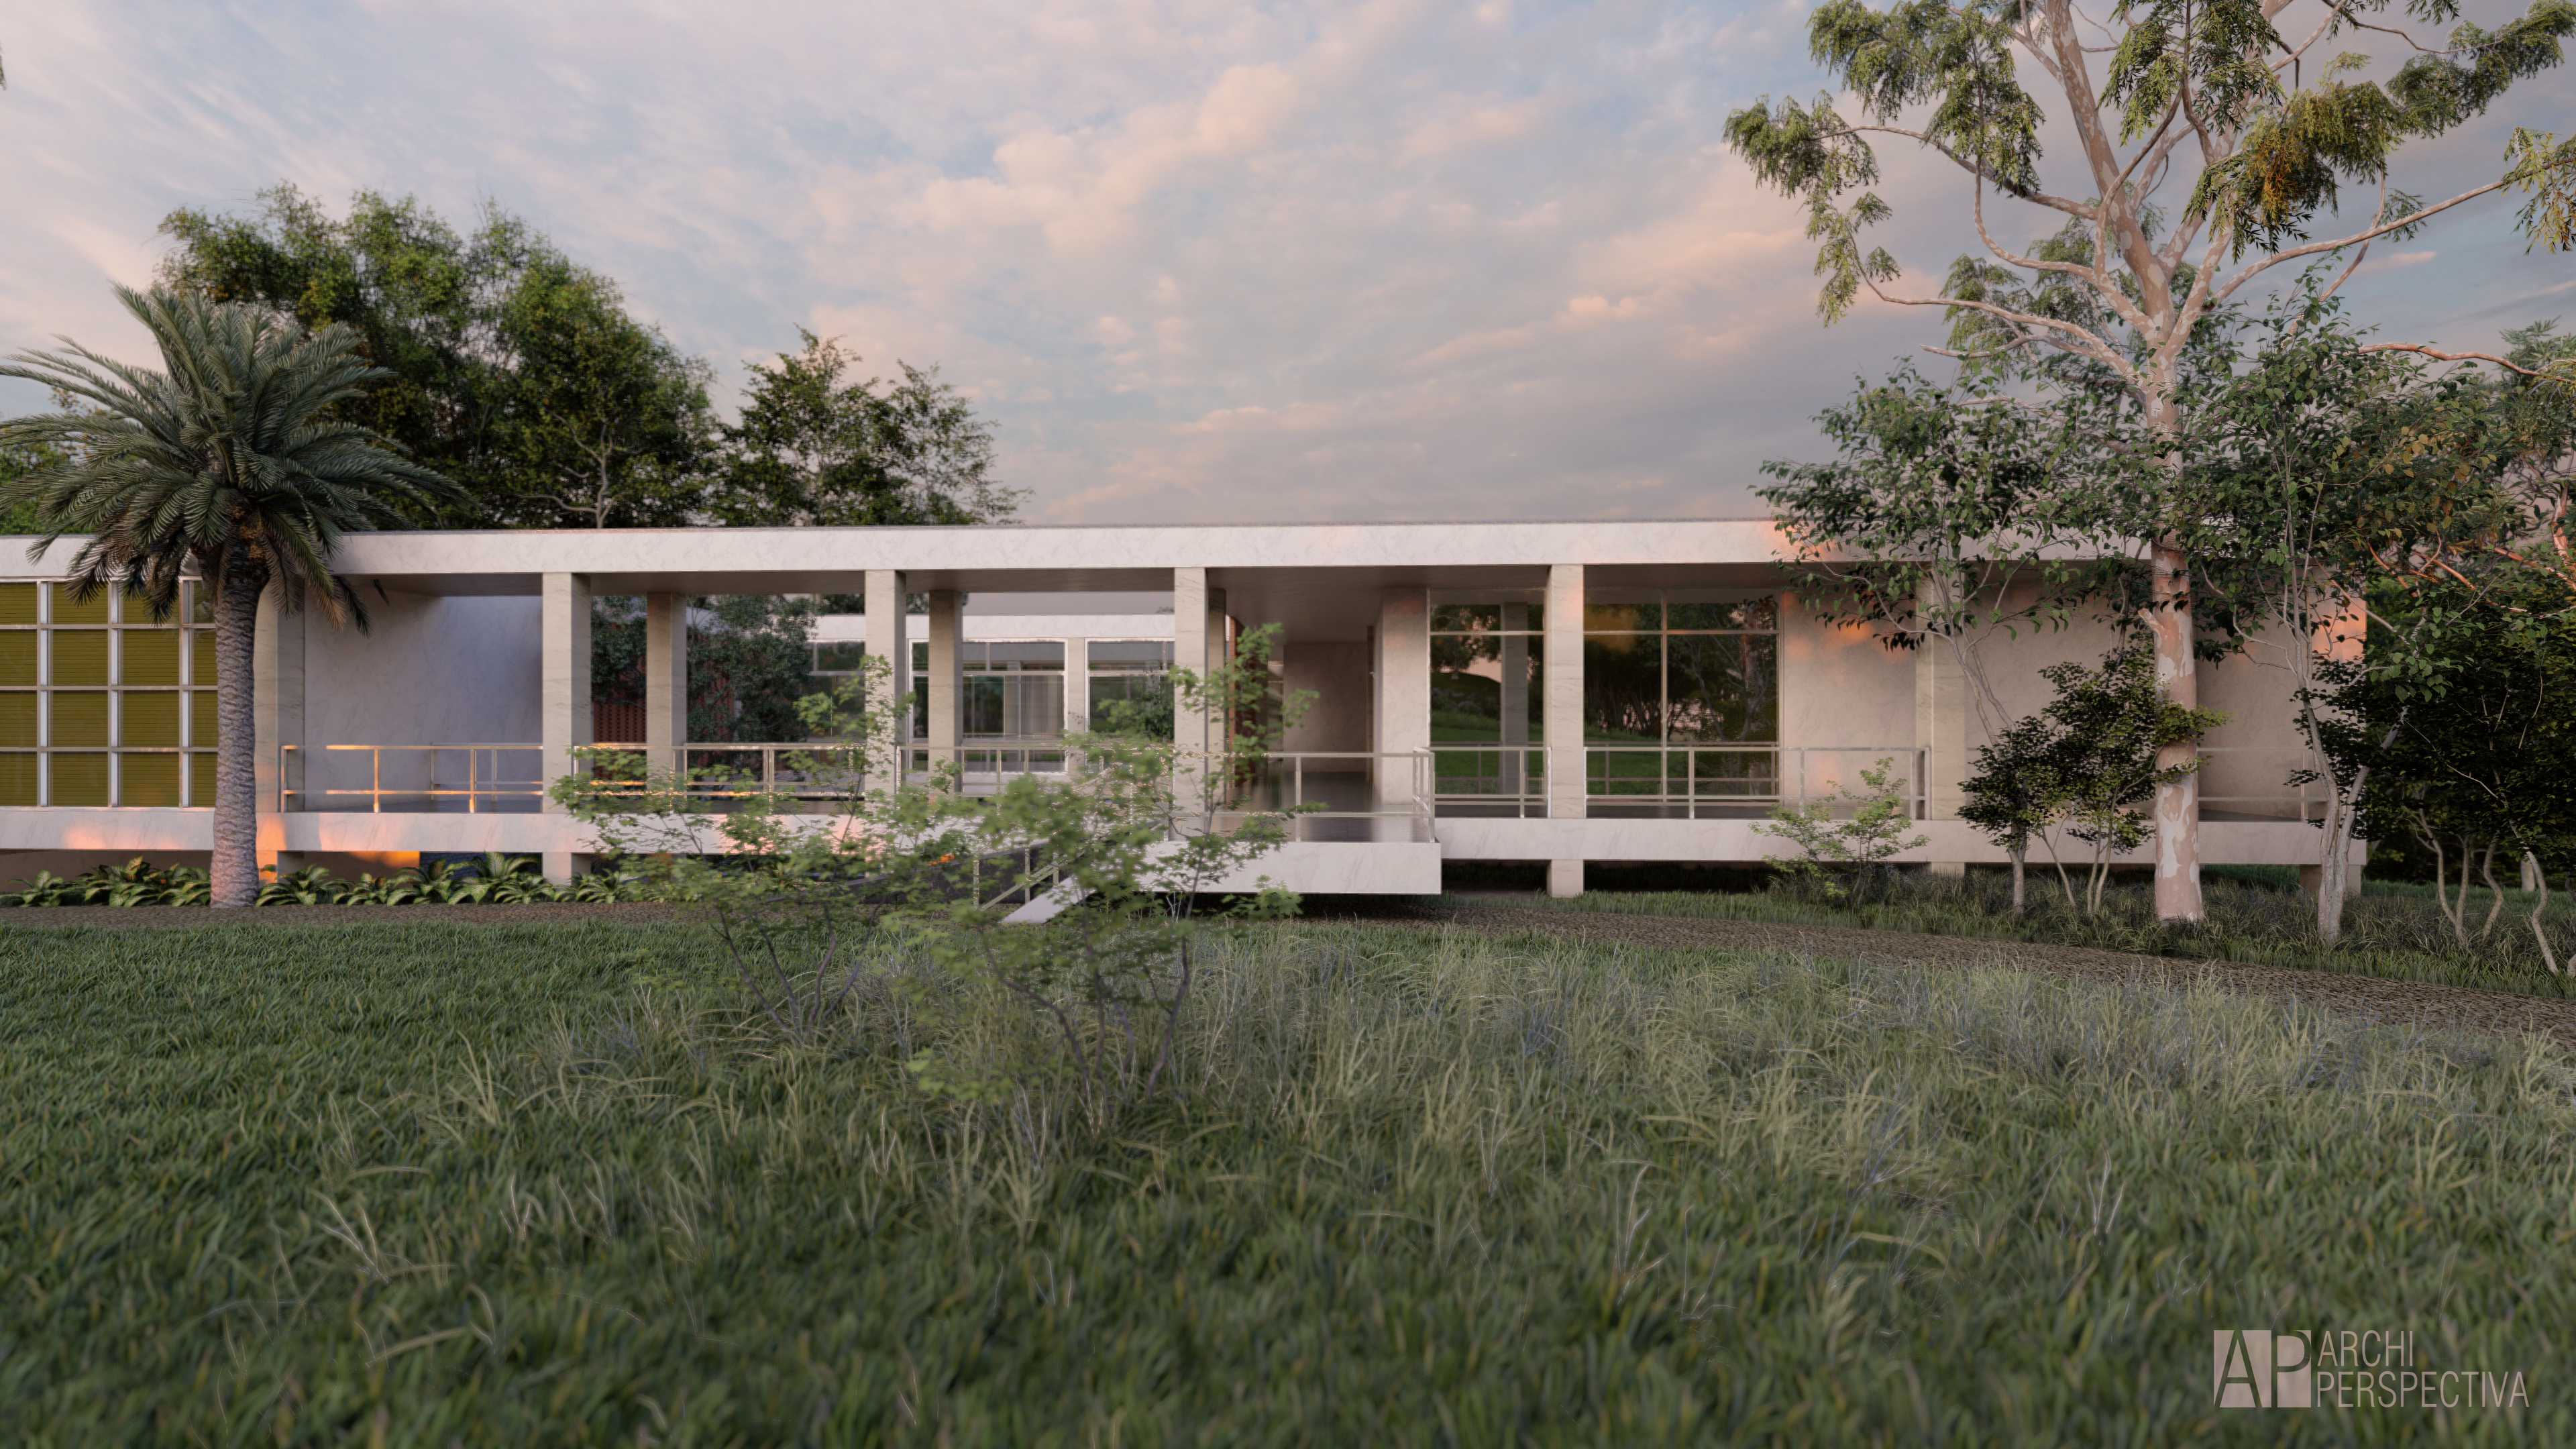 brasilian architecture lumio render